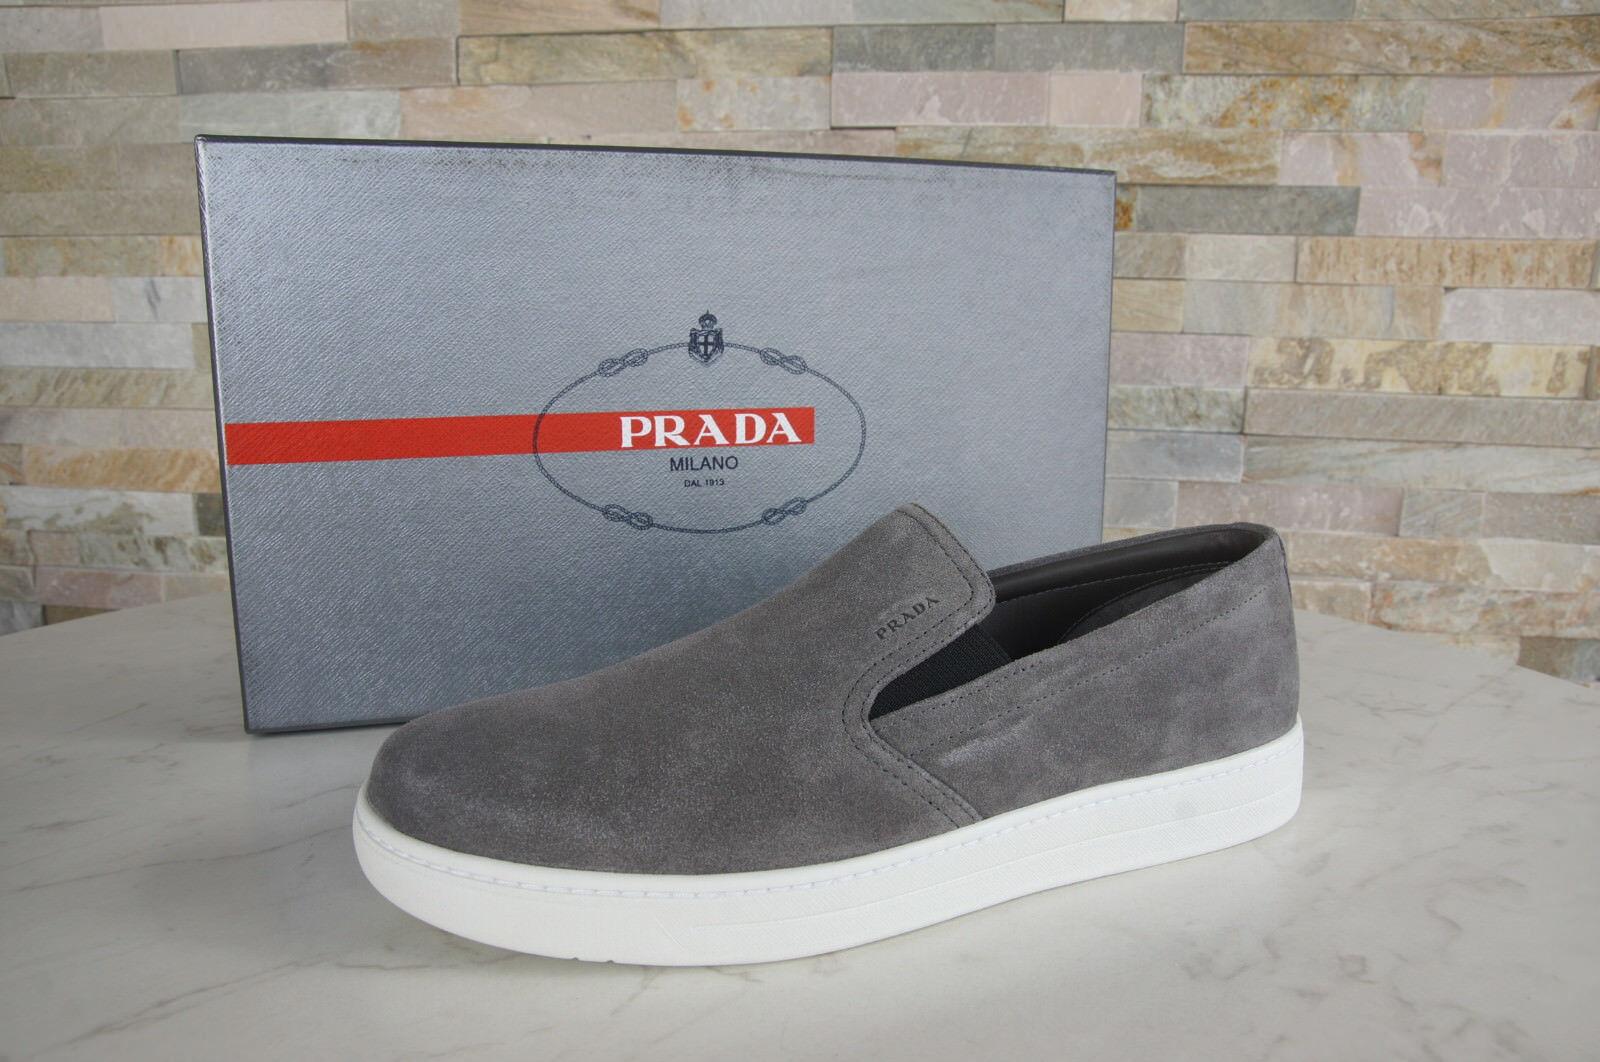 PRADA Gr 6 40 40 6 Slipper Slip-Ons Sneakers Halbschuhe 4D2733 grau Kies NEU 8fce32